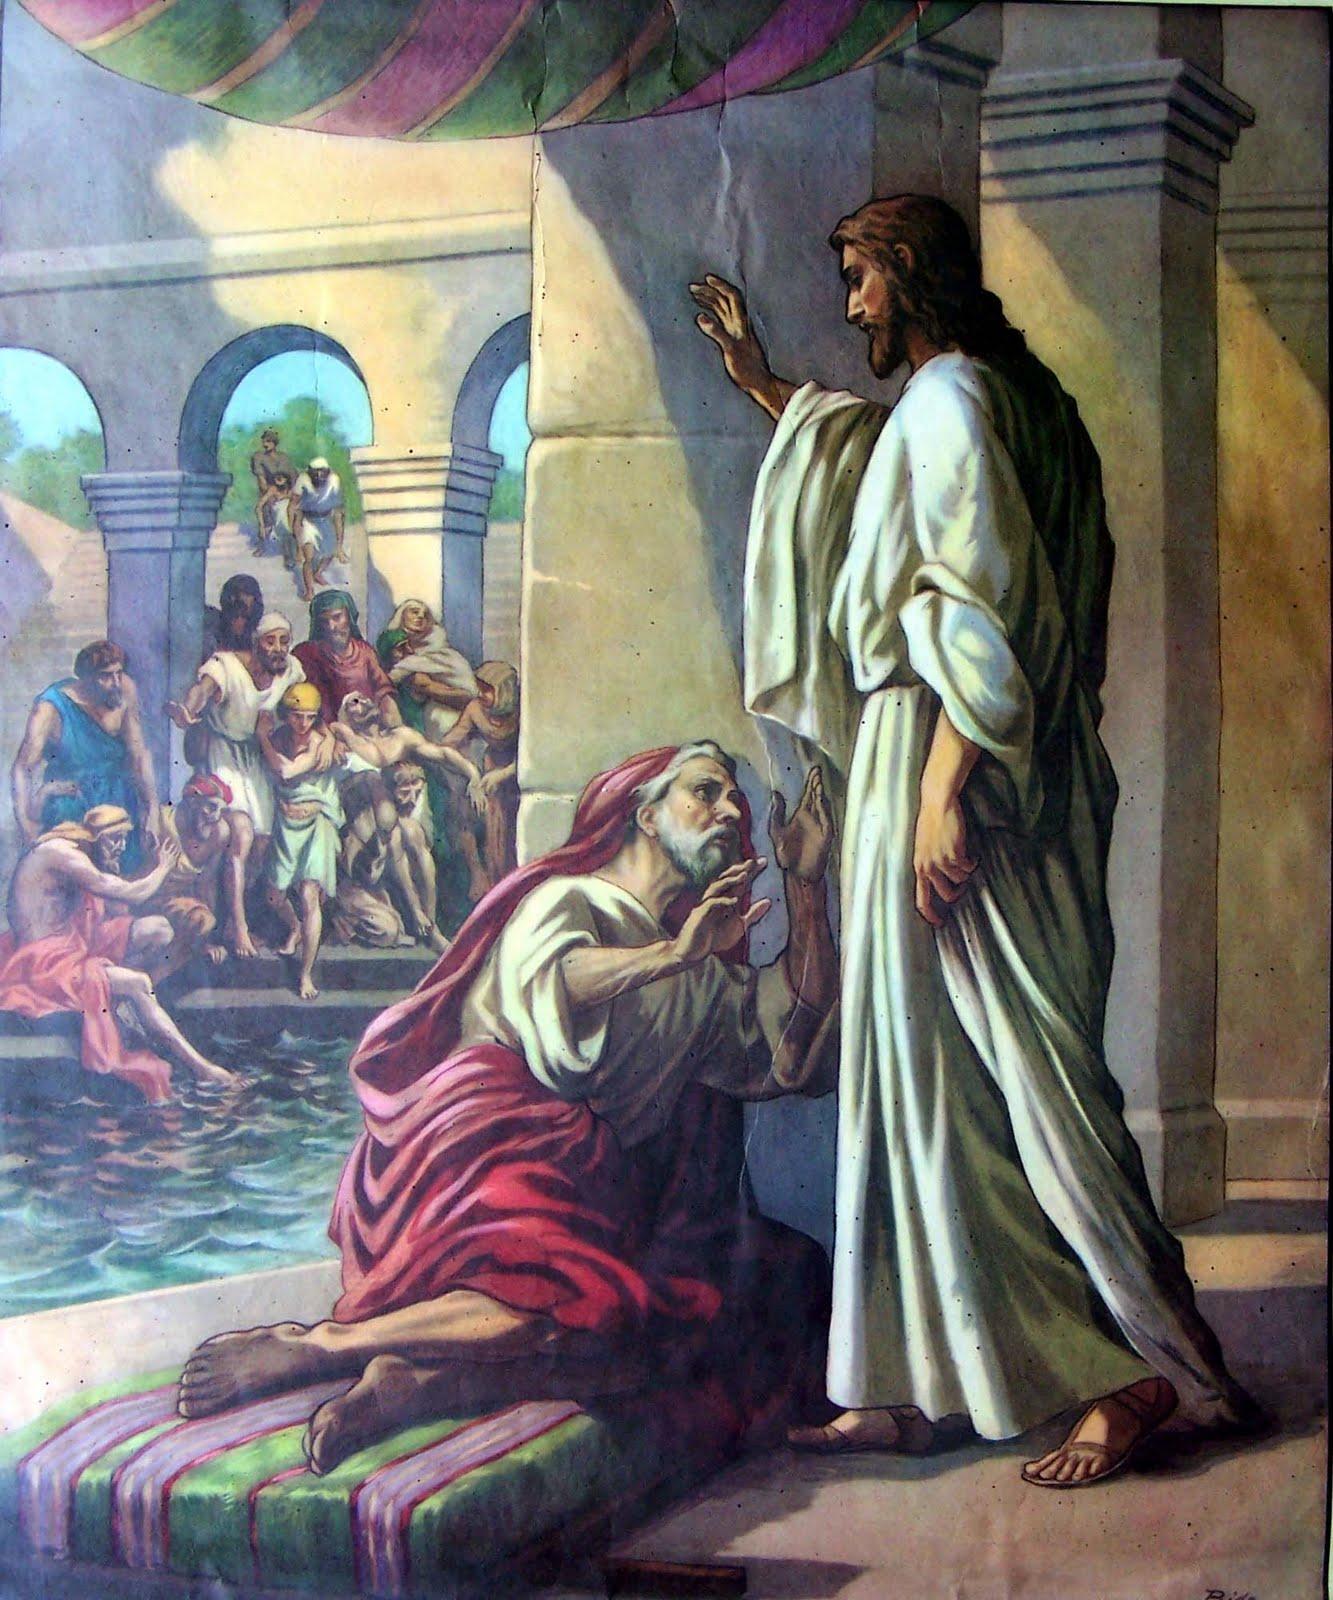 Jesus heals man at pool of bethesda coloring page hot for Healing at the pool of bethesda coloring page